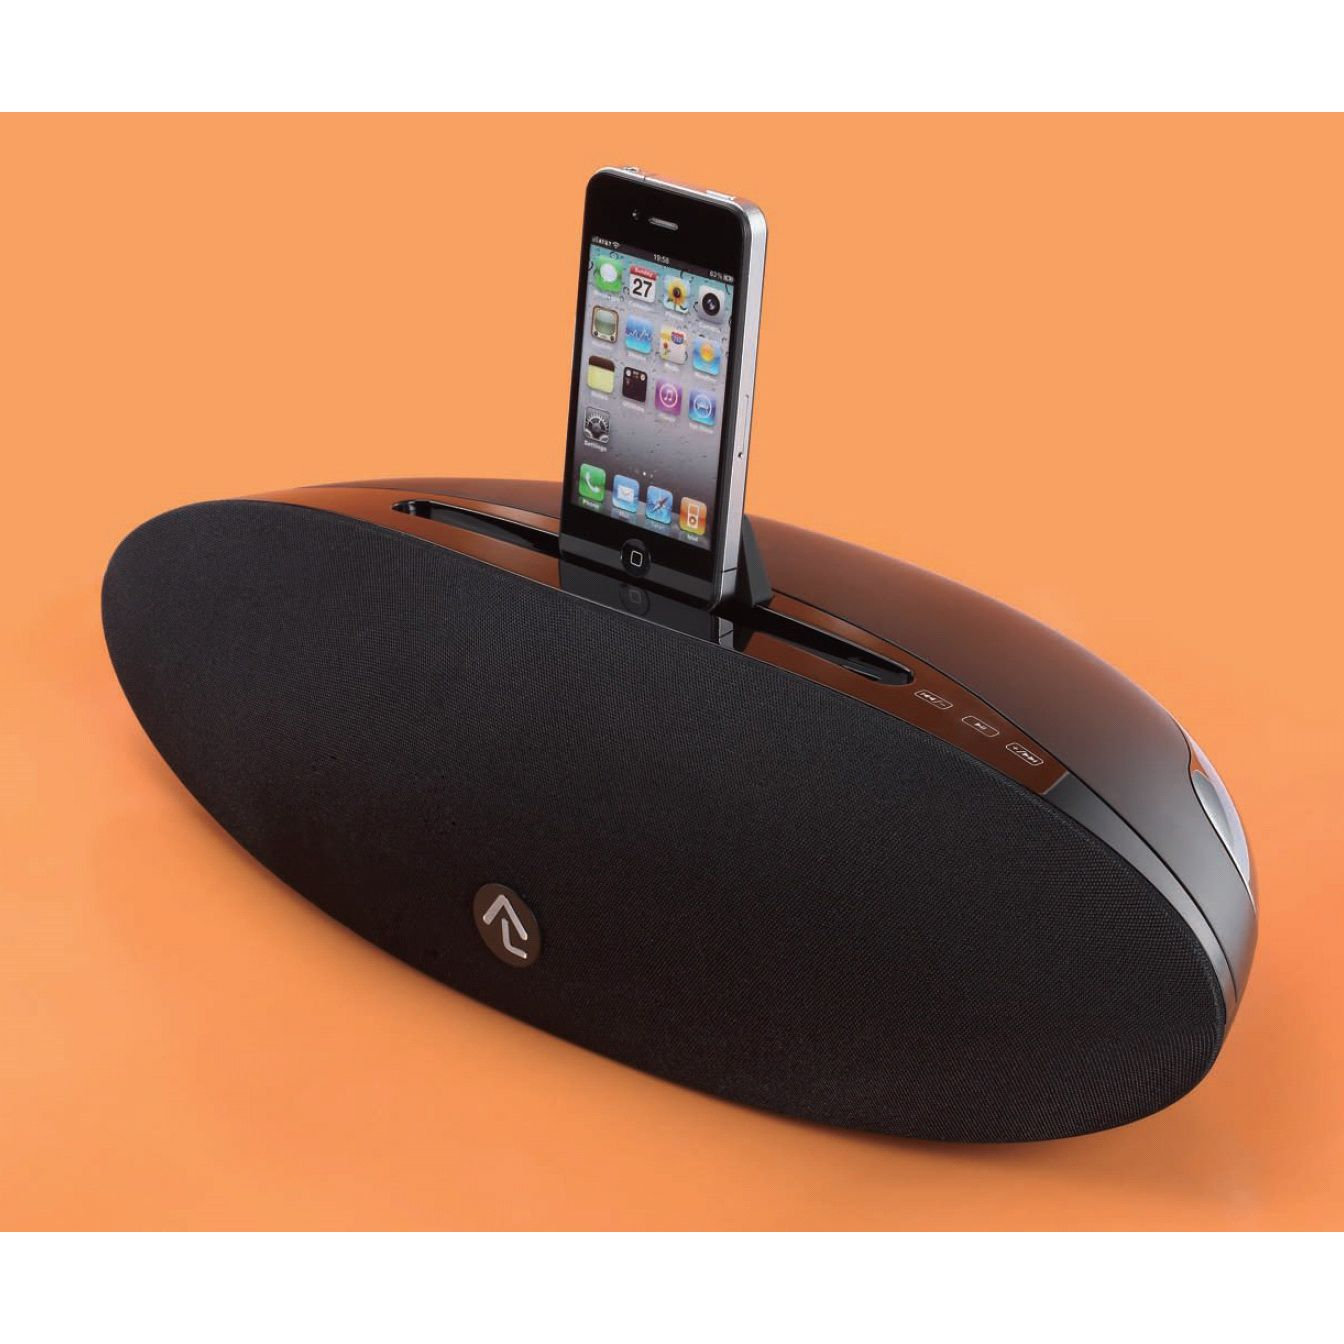 Alphaline™ Docking Speaker for iPhone/iPad